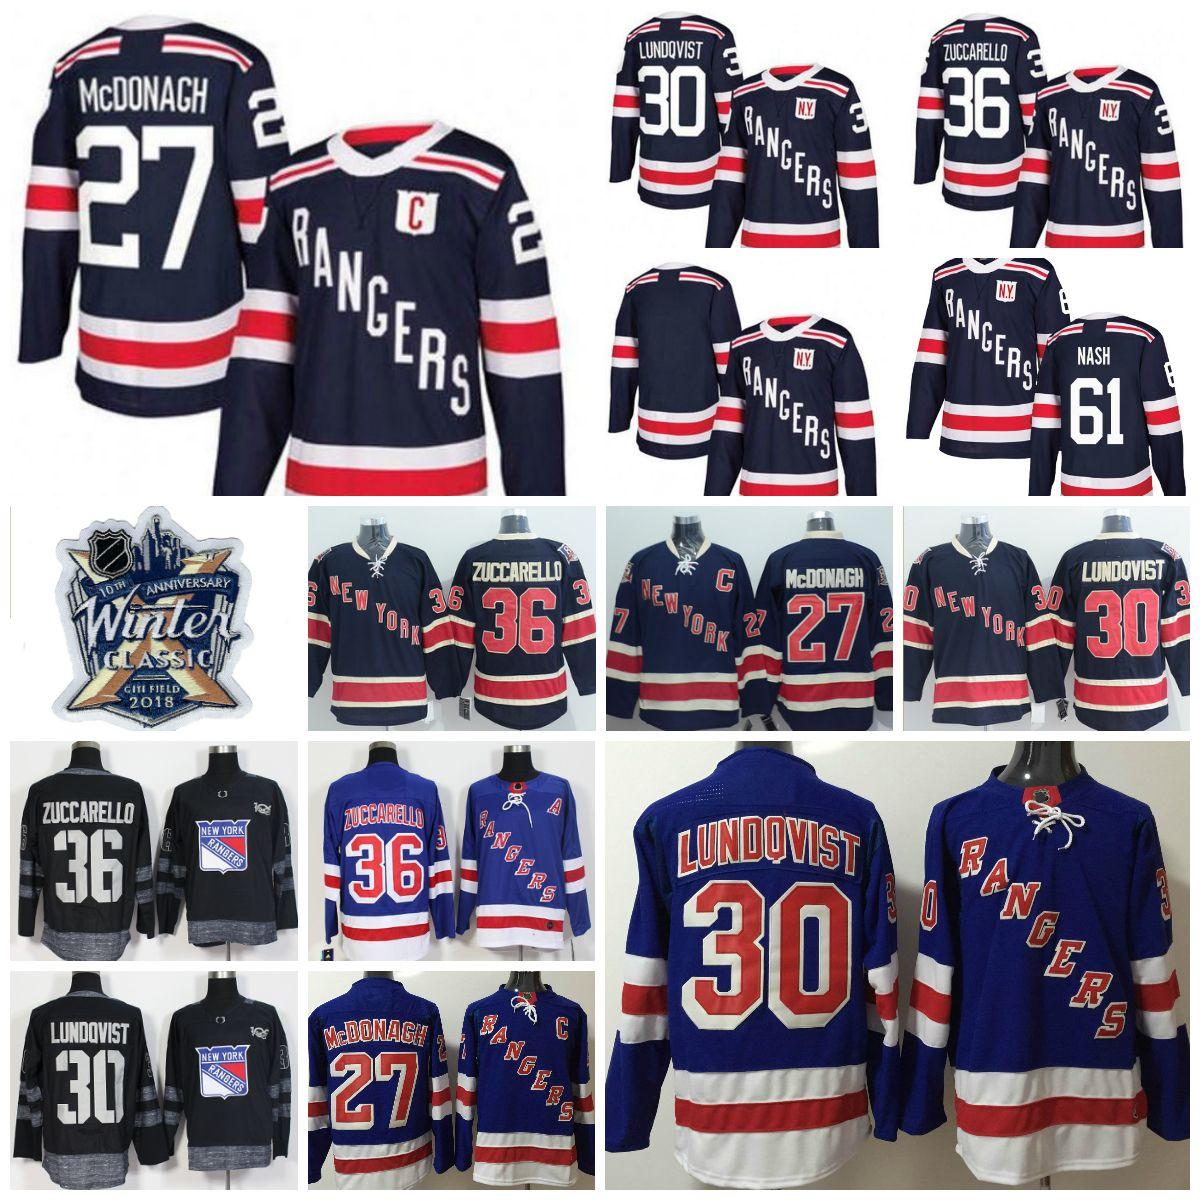 2019 2018 Winter Classic AD New York Rangers 30 Henrik Lundqvist Mats  Zuccarello Ryan McDonagh Kreider Rick Nash 100th Anniversary Hockey Jerseys  From ... da655cf01